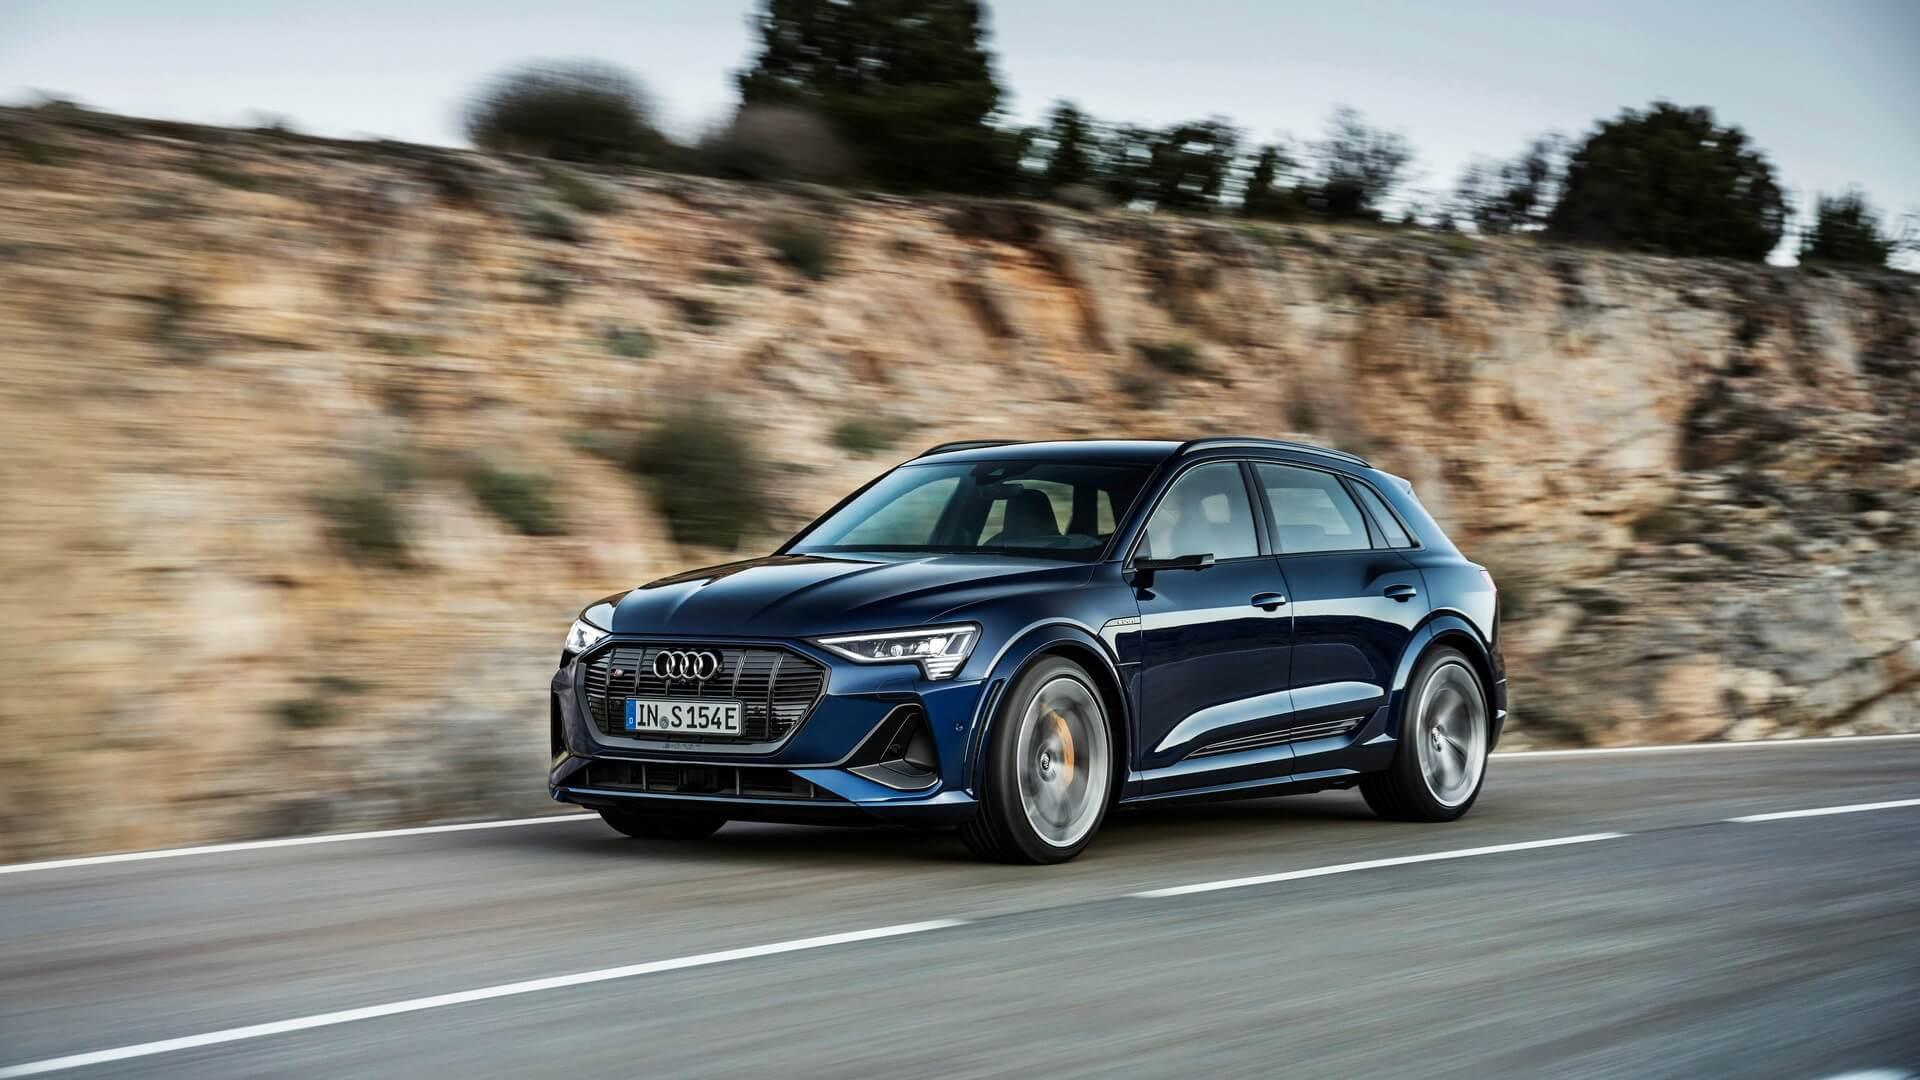 Audi-E-Tron-S-and-E-Tron-S-Sportback-2020-2